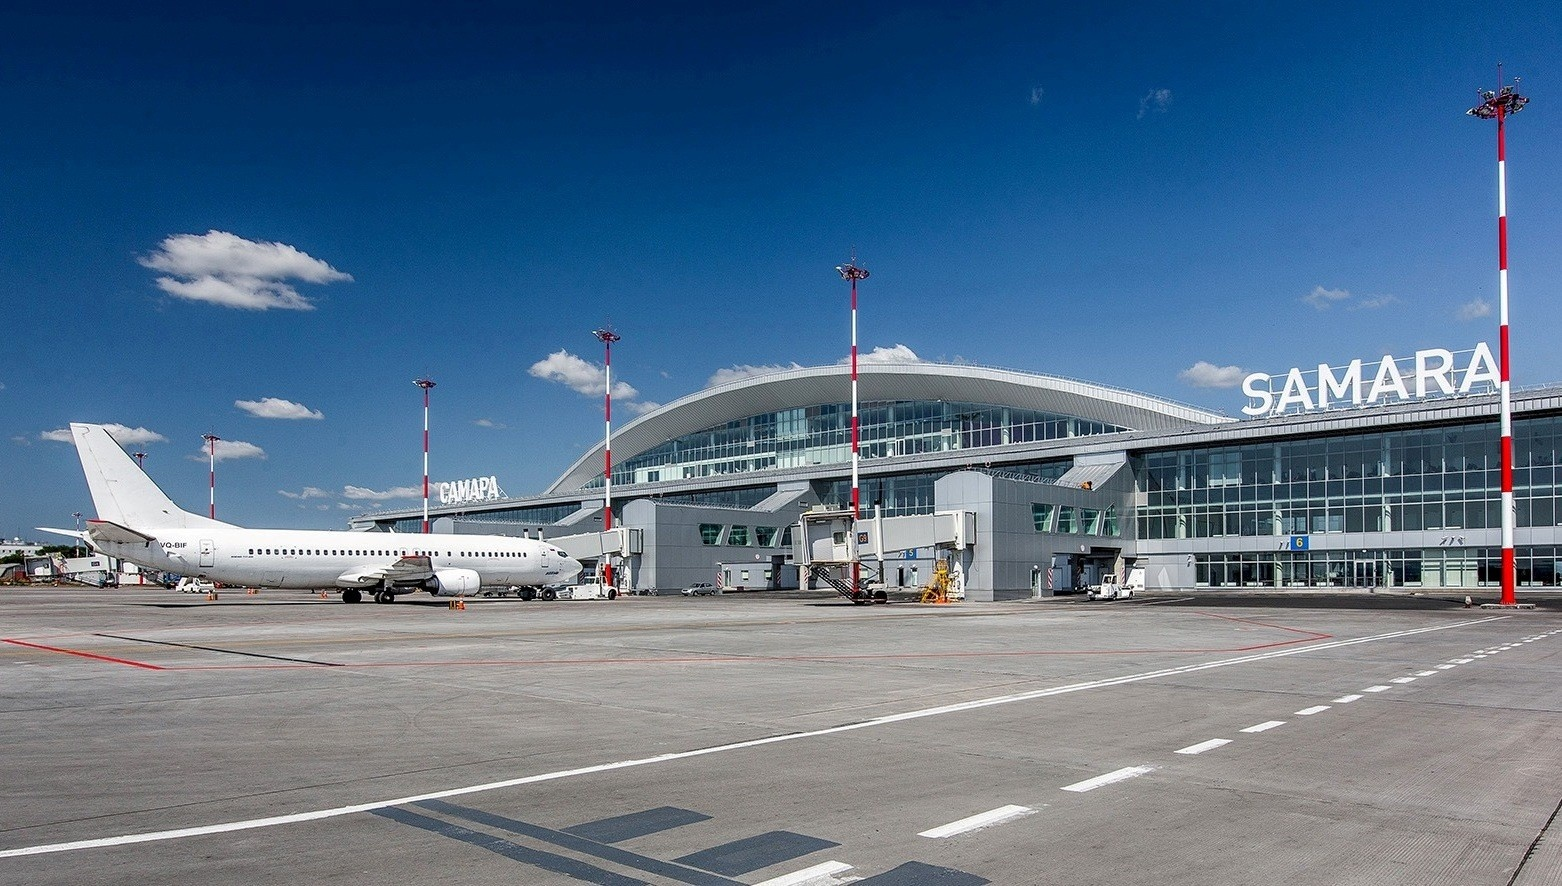 Международный аэропорт Самара (Курумоч), Самара